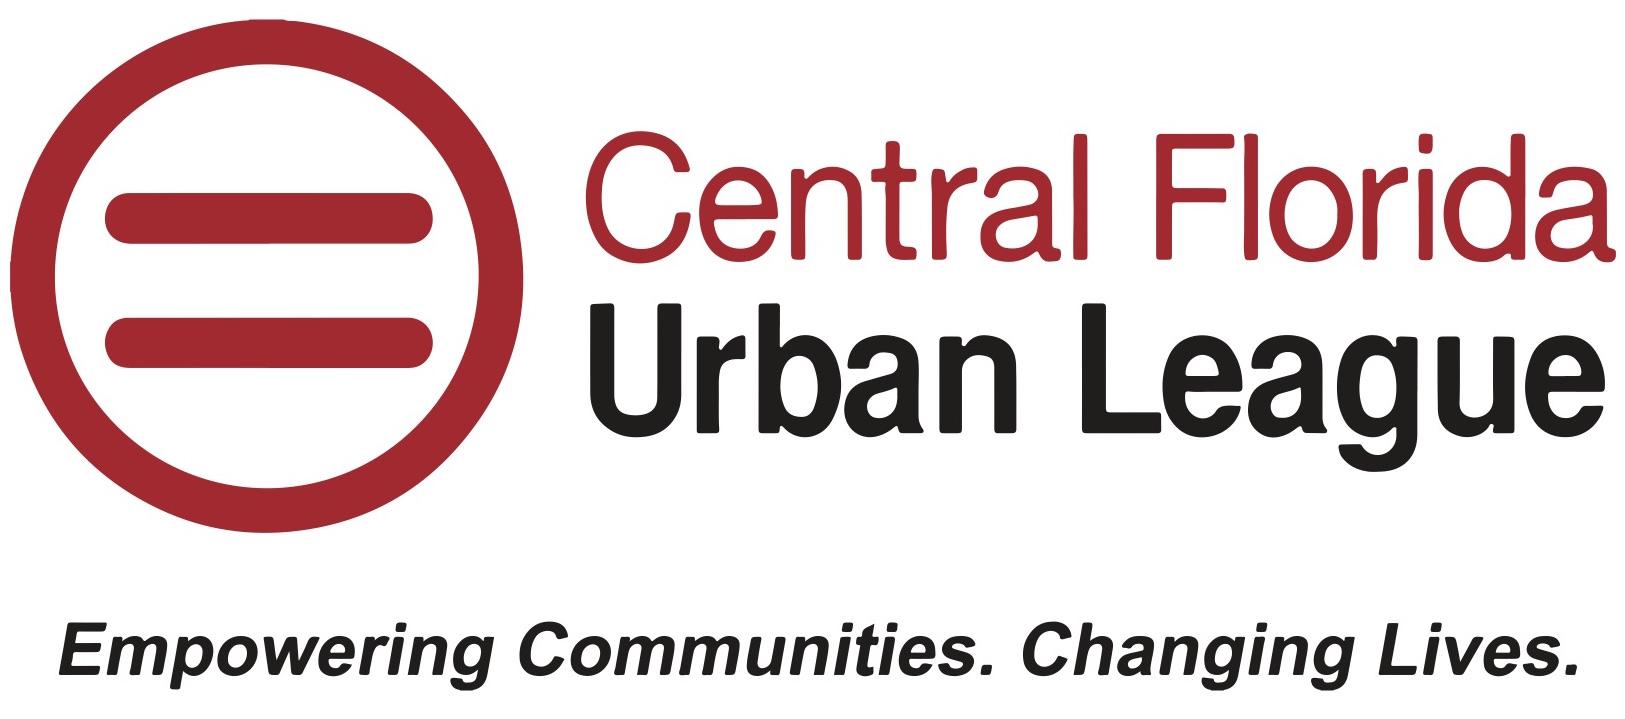 CFUL-logo.jpg